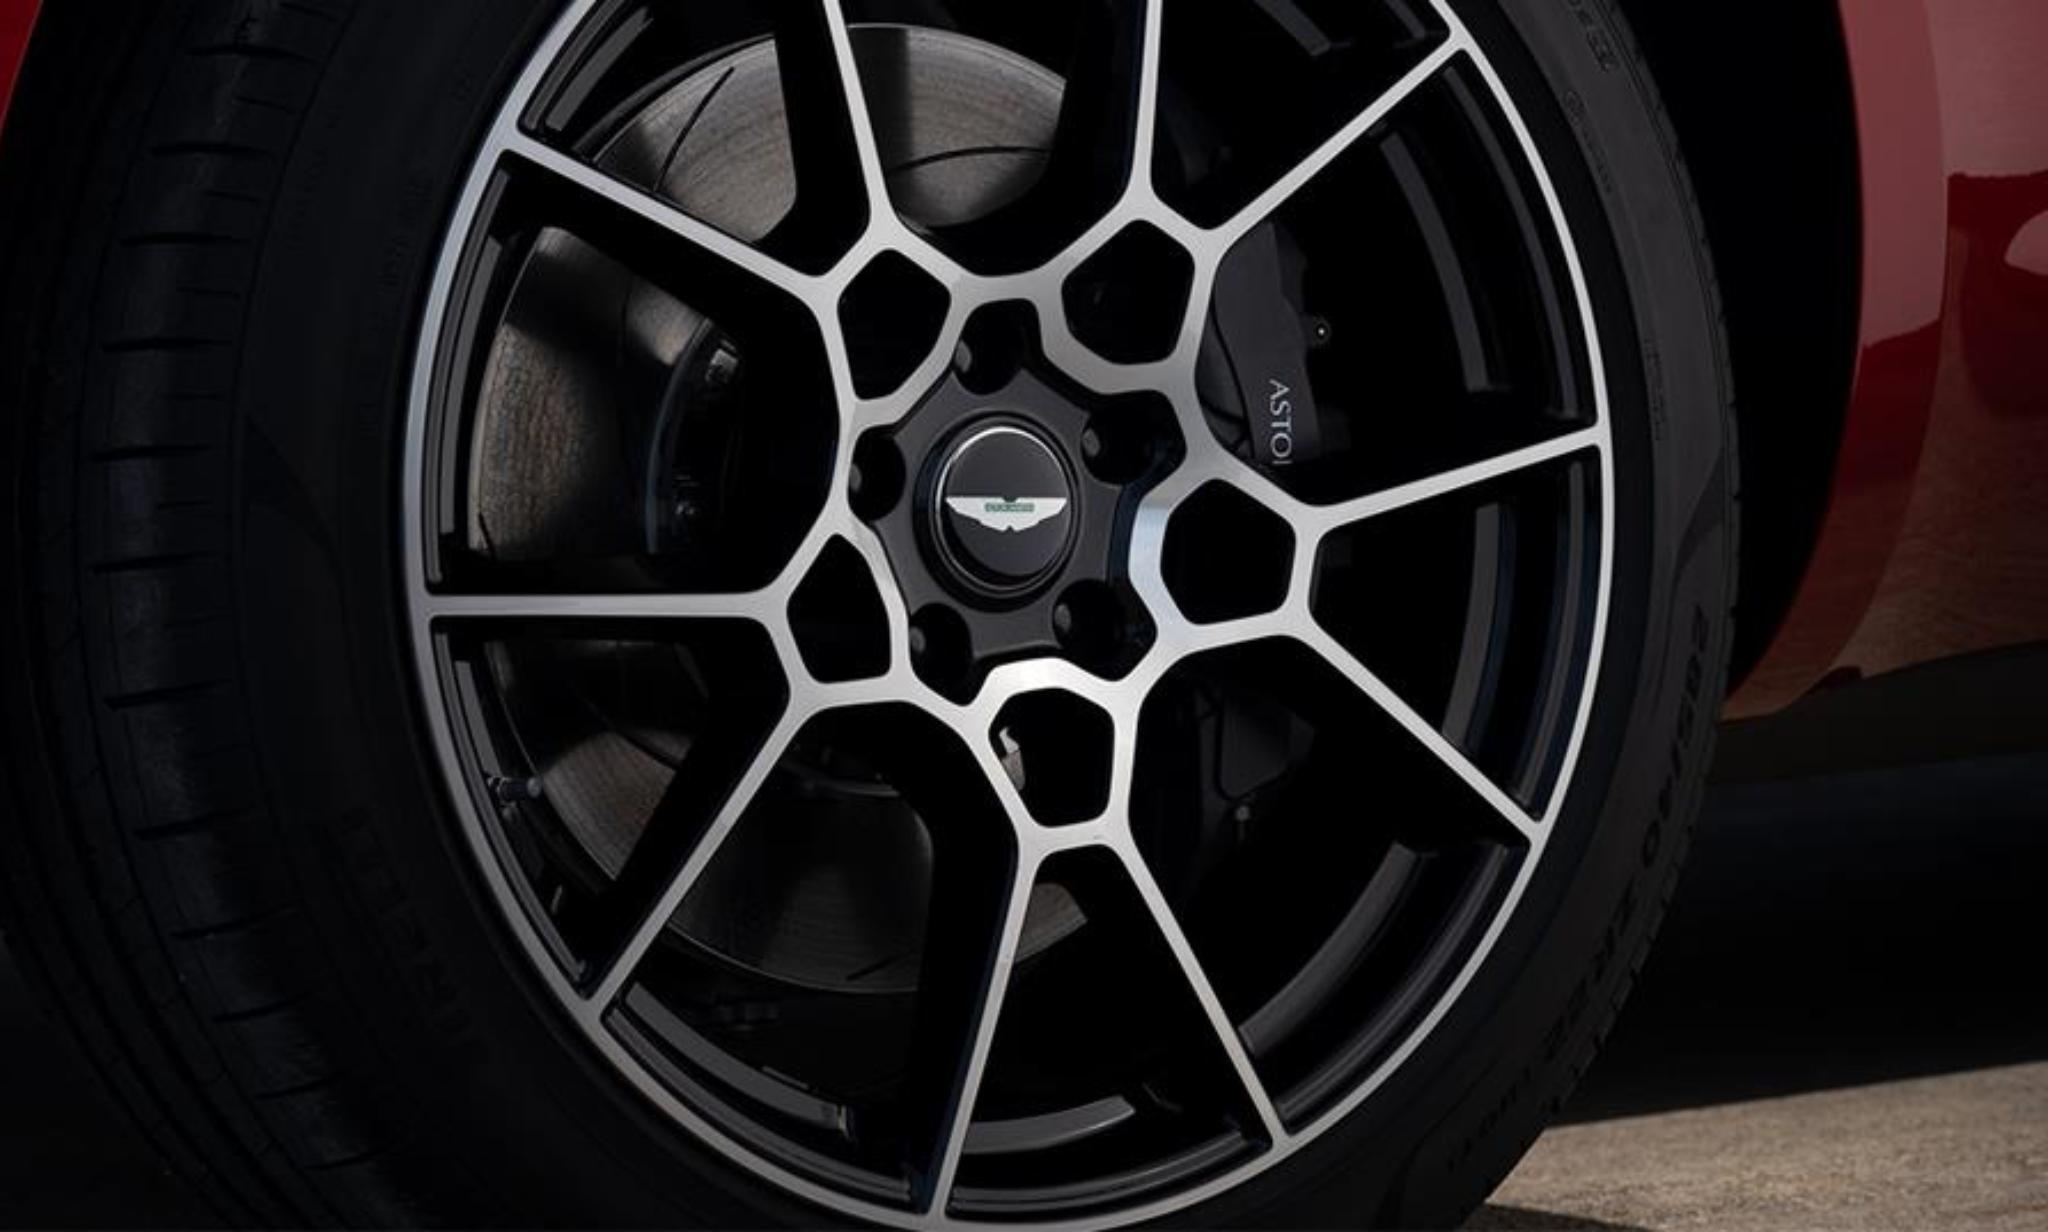 Aston Martin DBX 22%22 Wheels